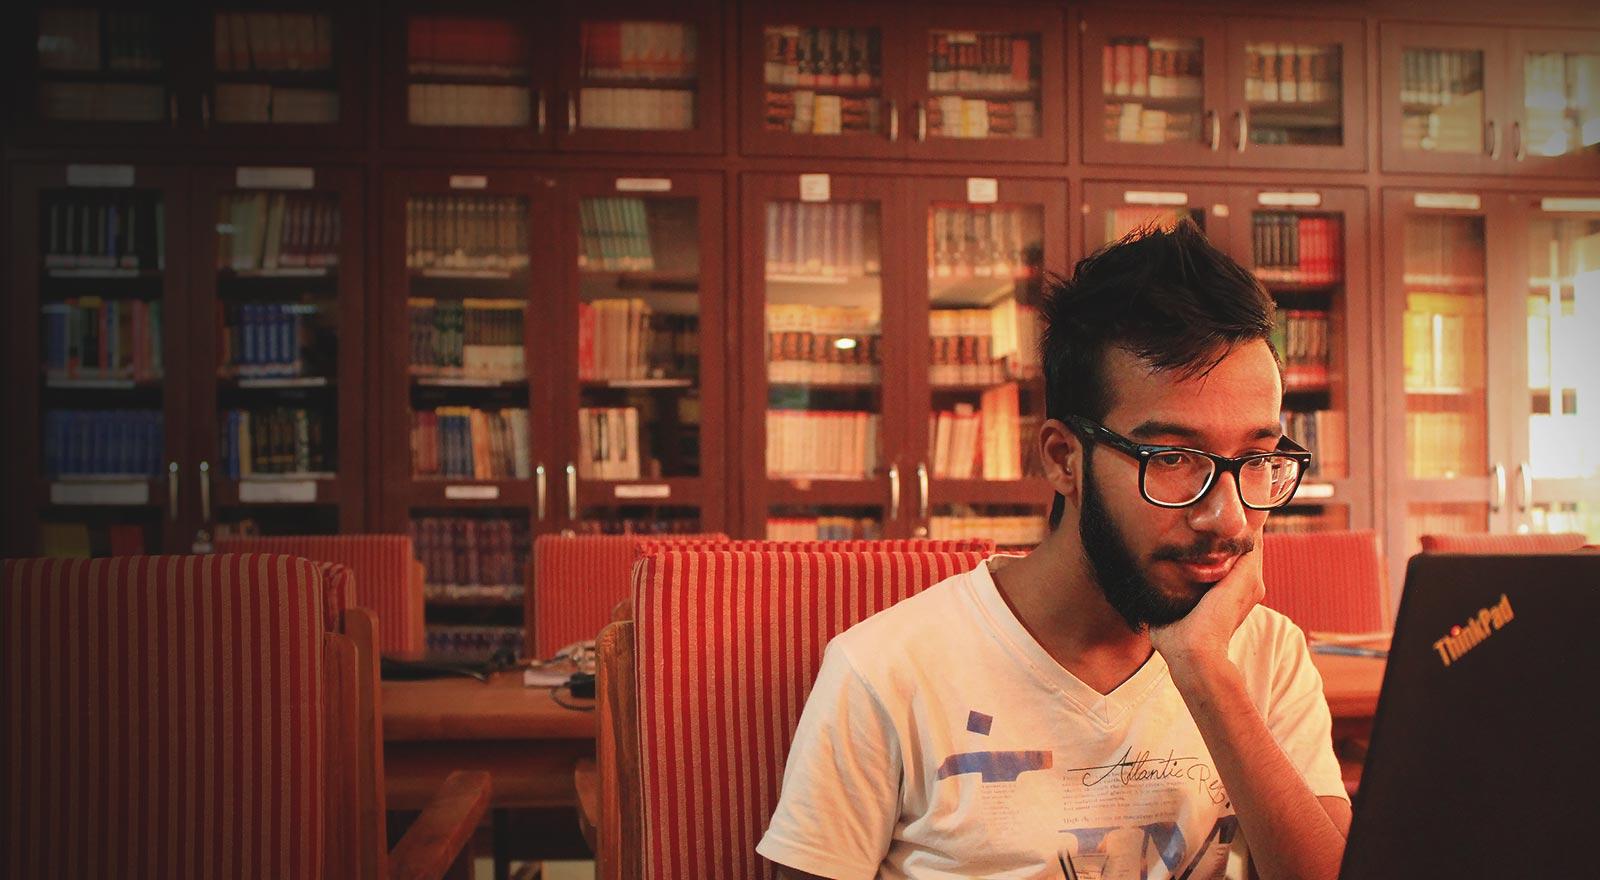 KIIT Academics Library